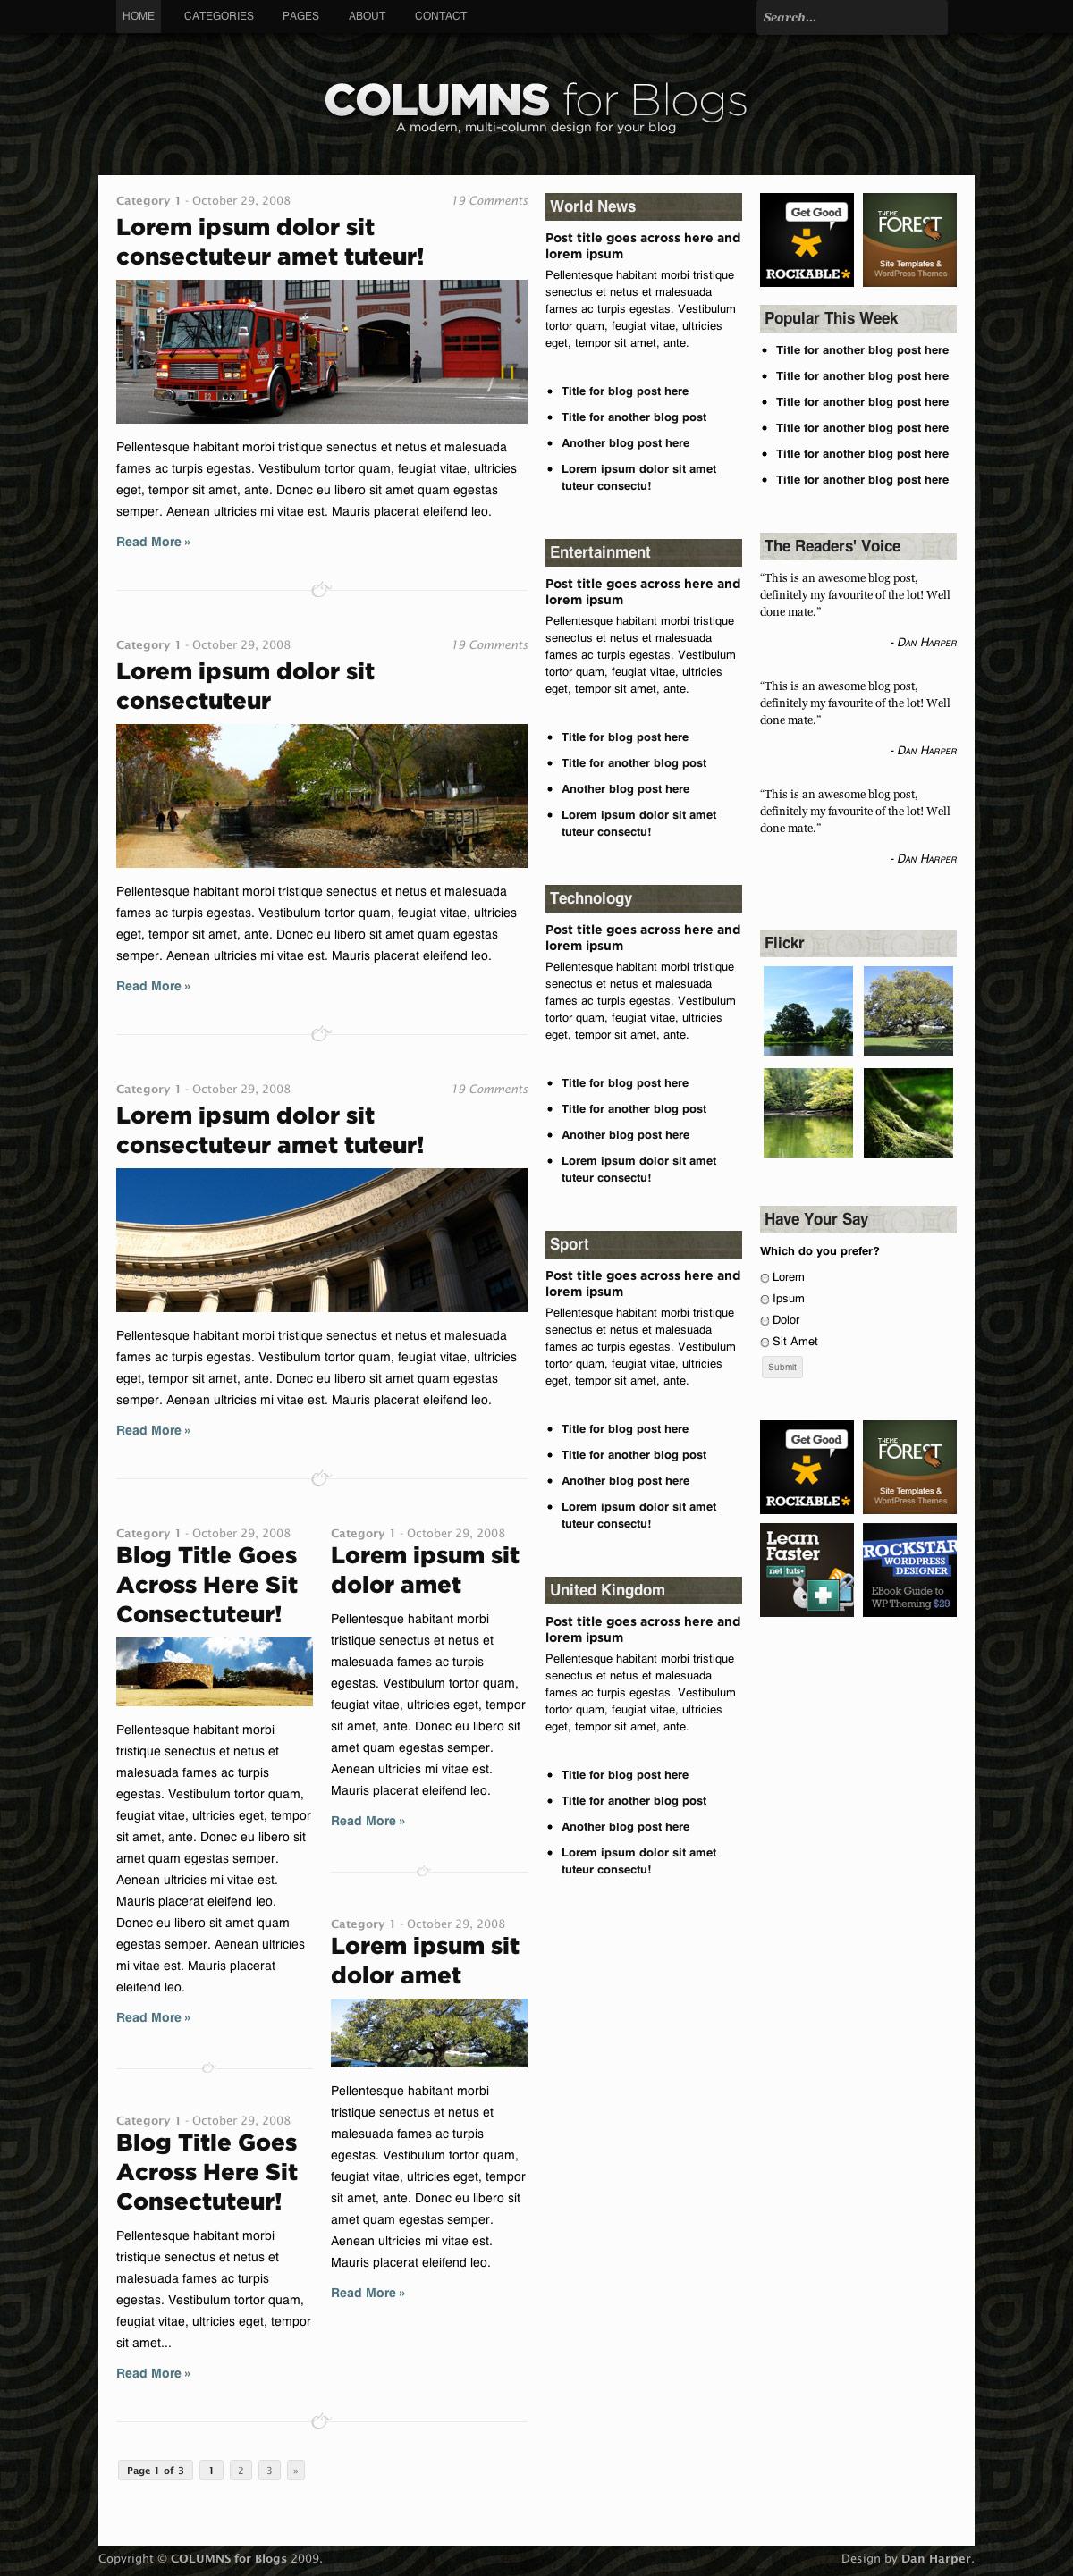 COLUMNS Blog Design - 3-column home page